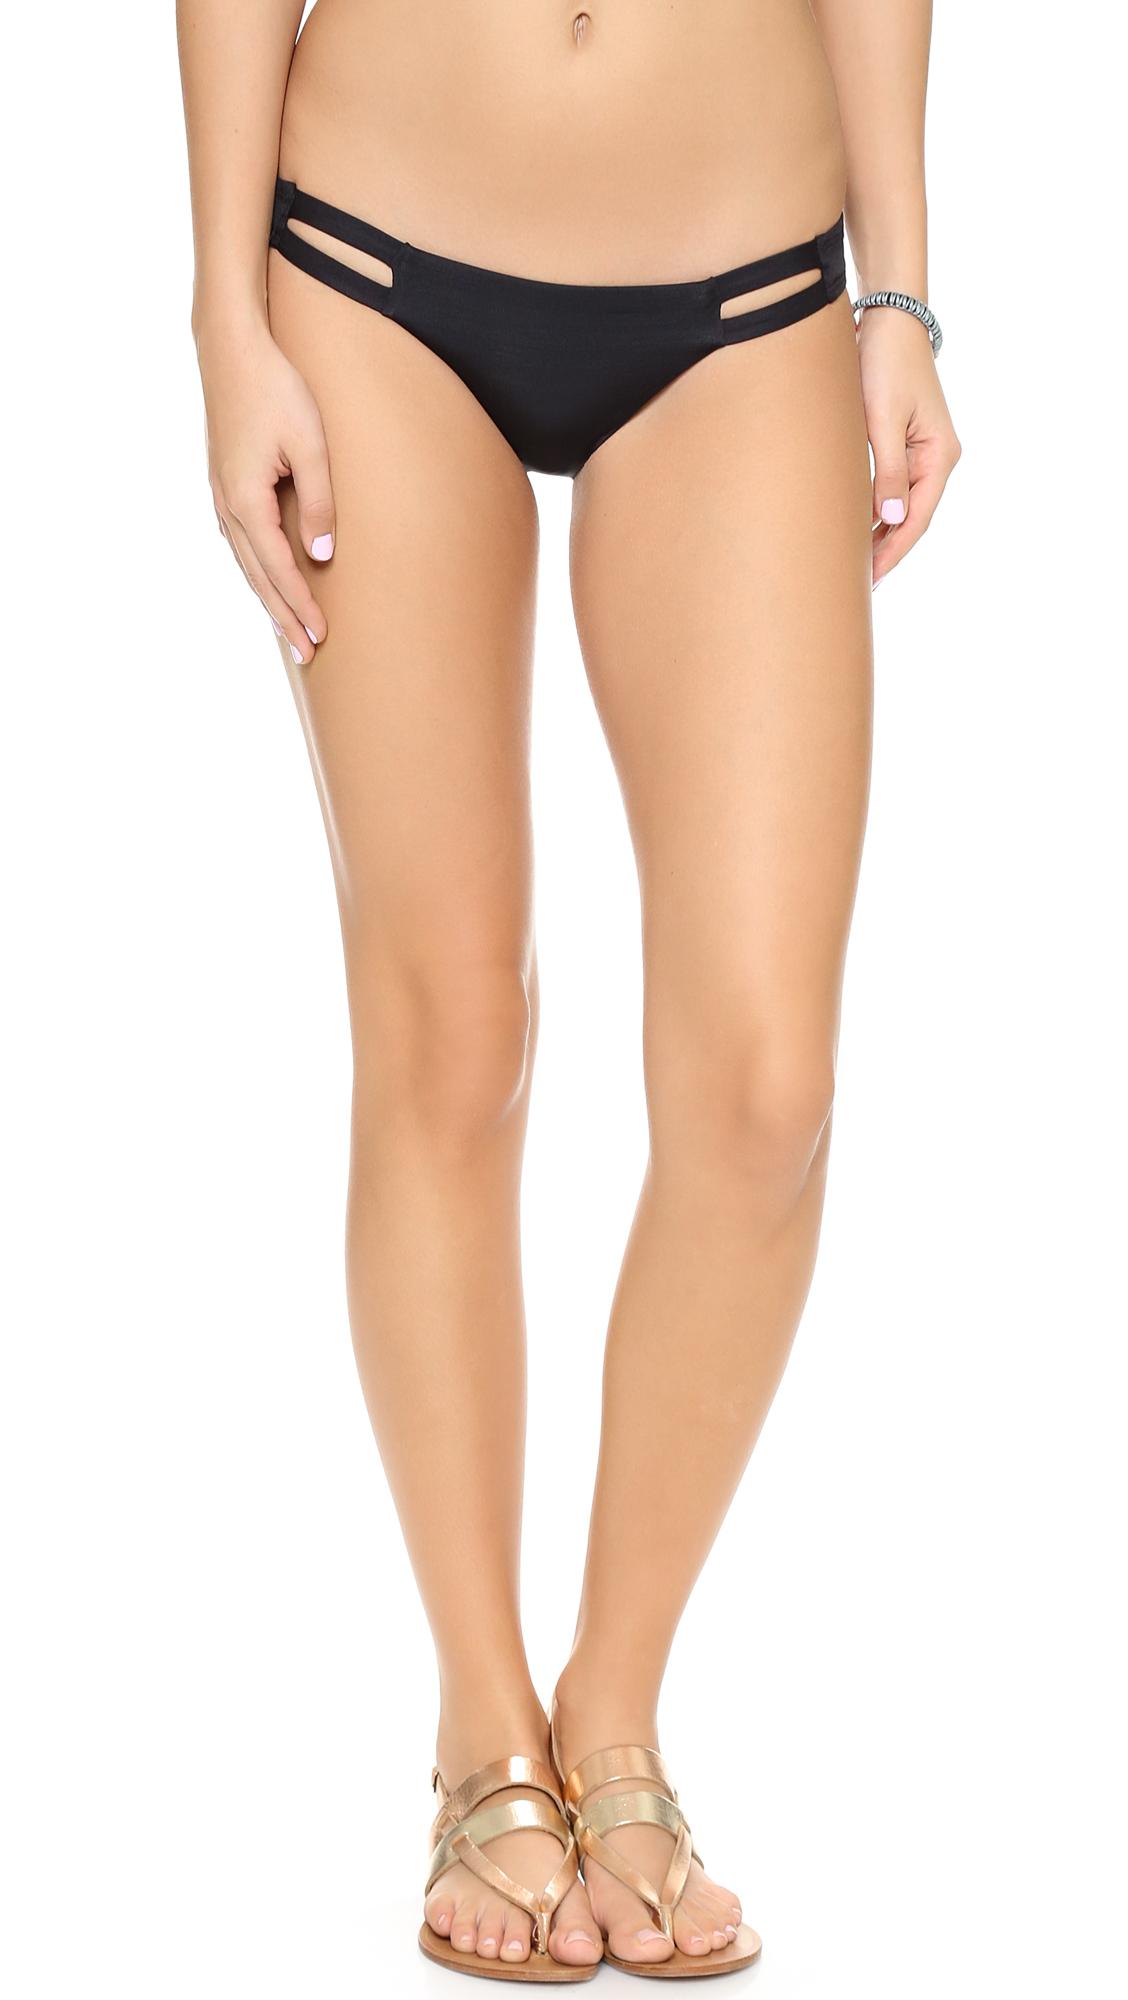 Vitamin A Neutra Hipster Bikini Bottom In Black